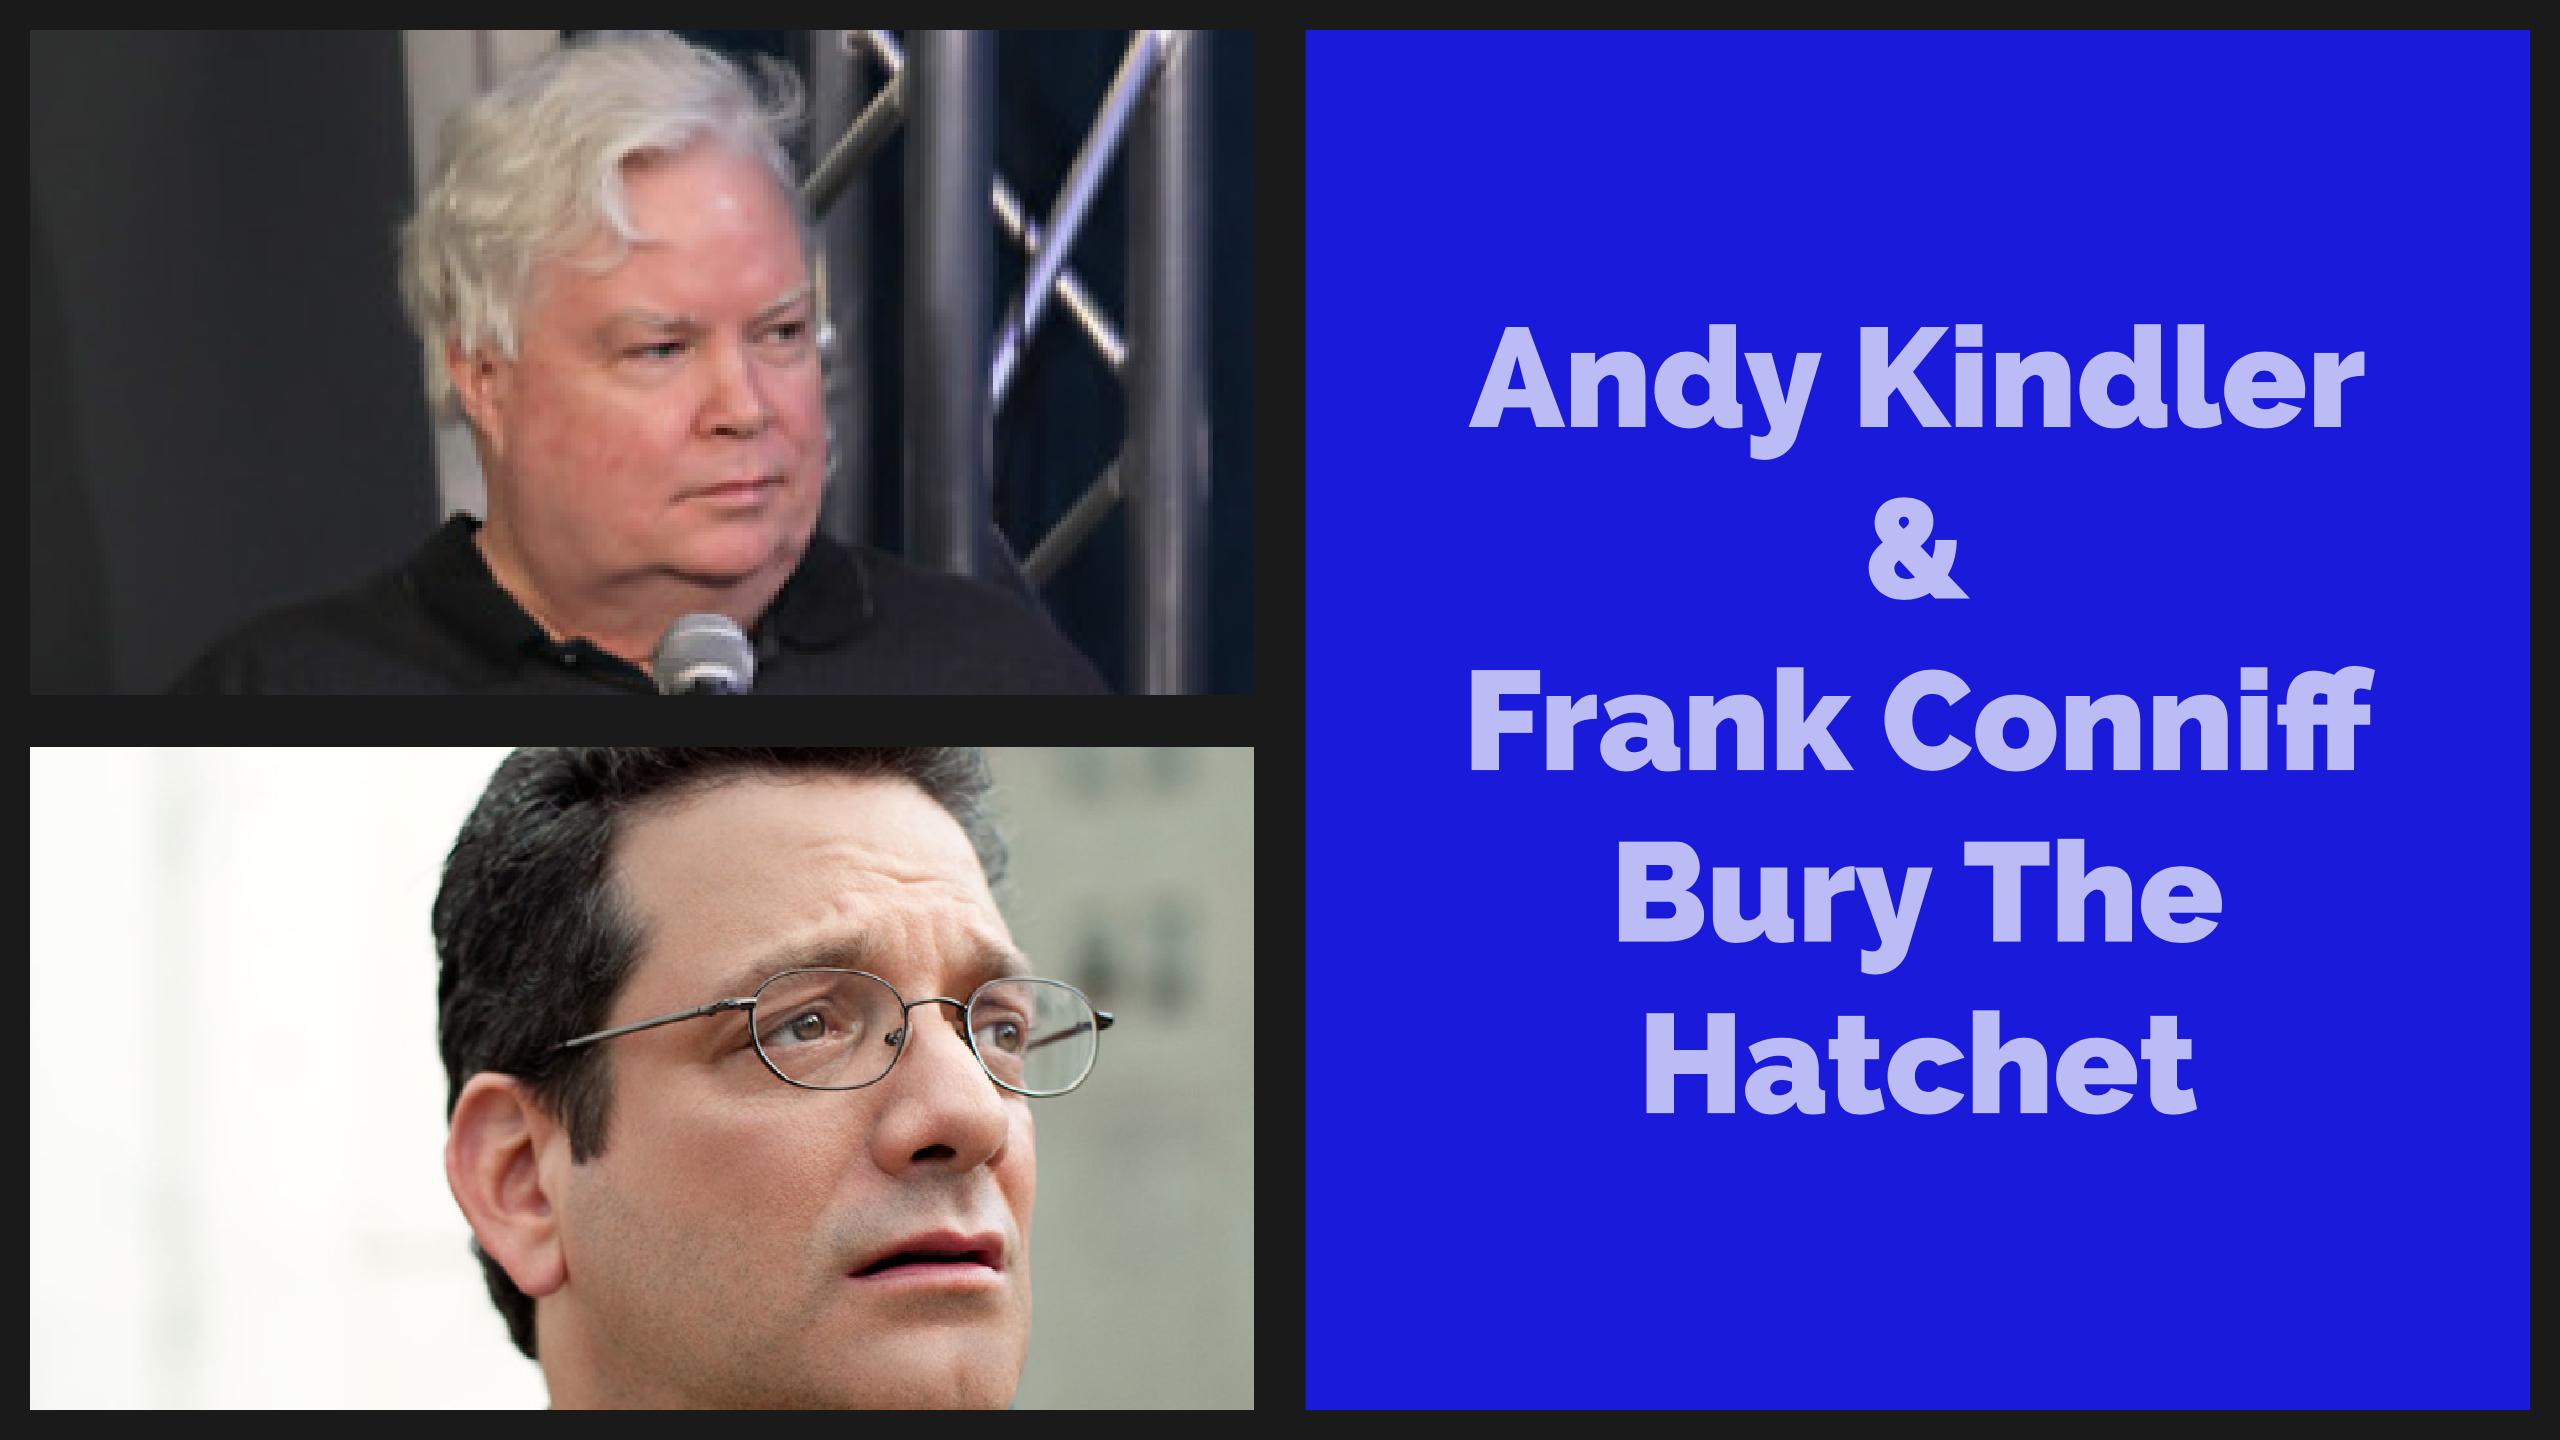 Andy Kindler & Frank Conniff on The David Feldman Show